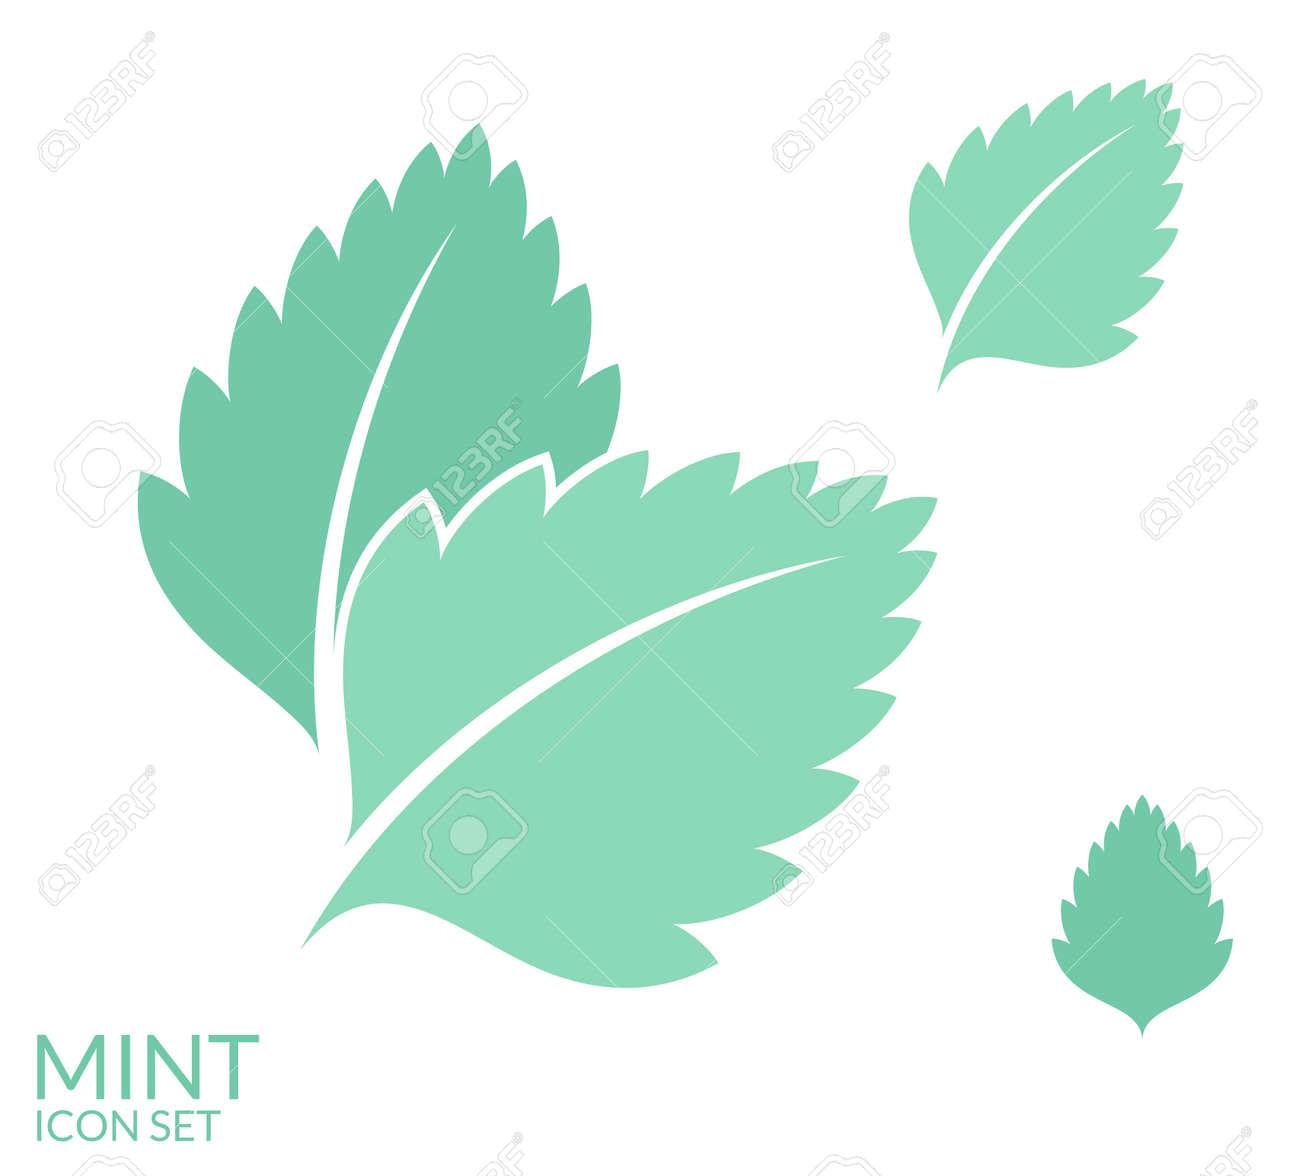 10 933 mint leaf stock illustrations cliparts and royalty free mint rh 123rf com leaf vector image leaf vector logo